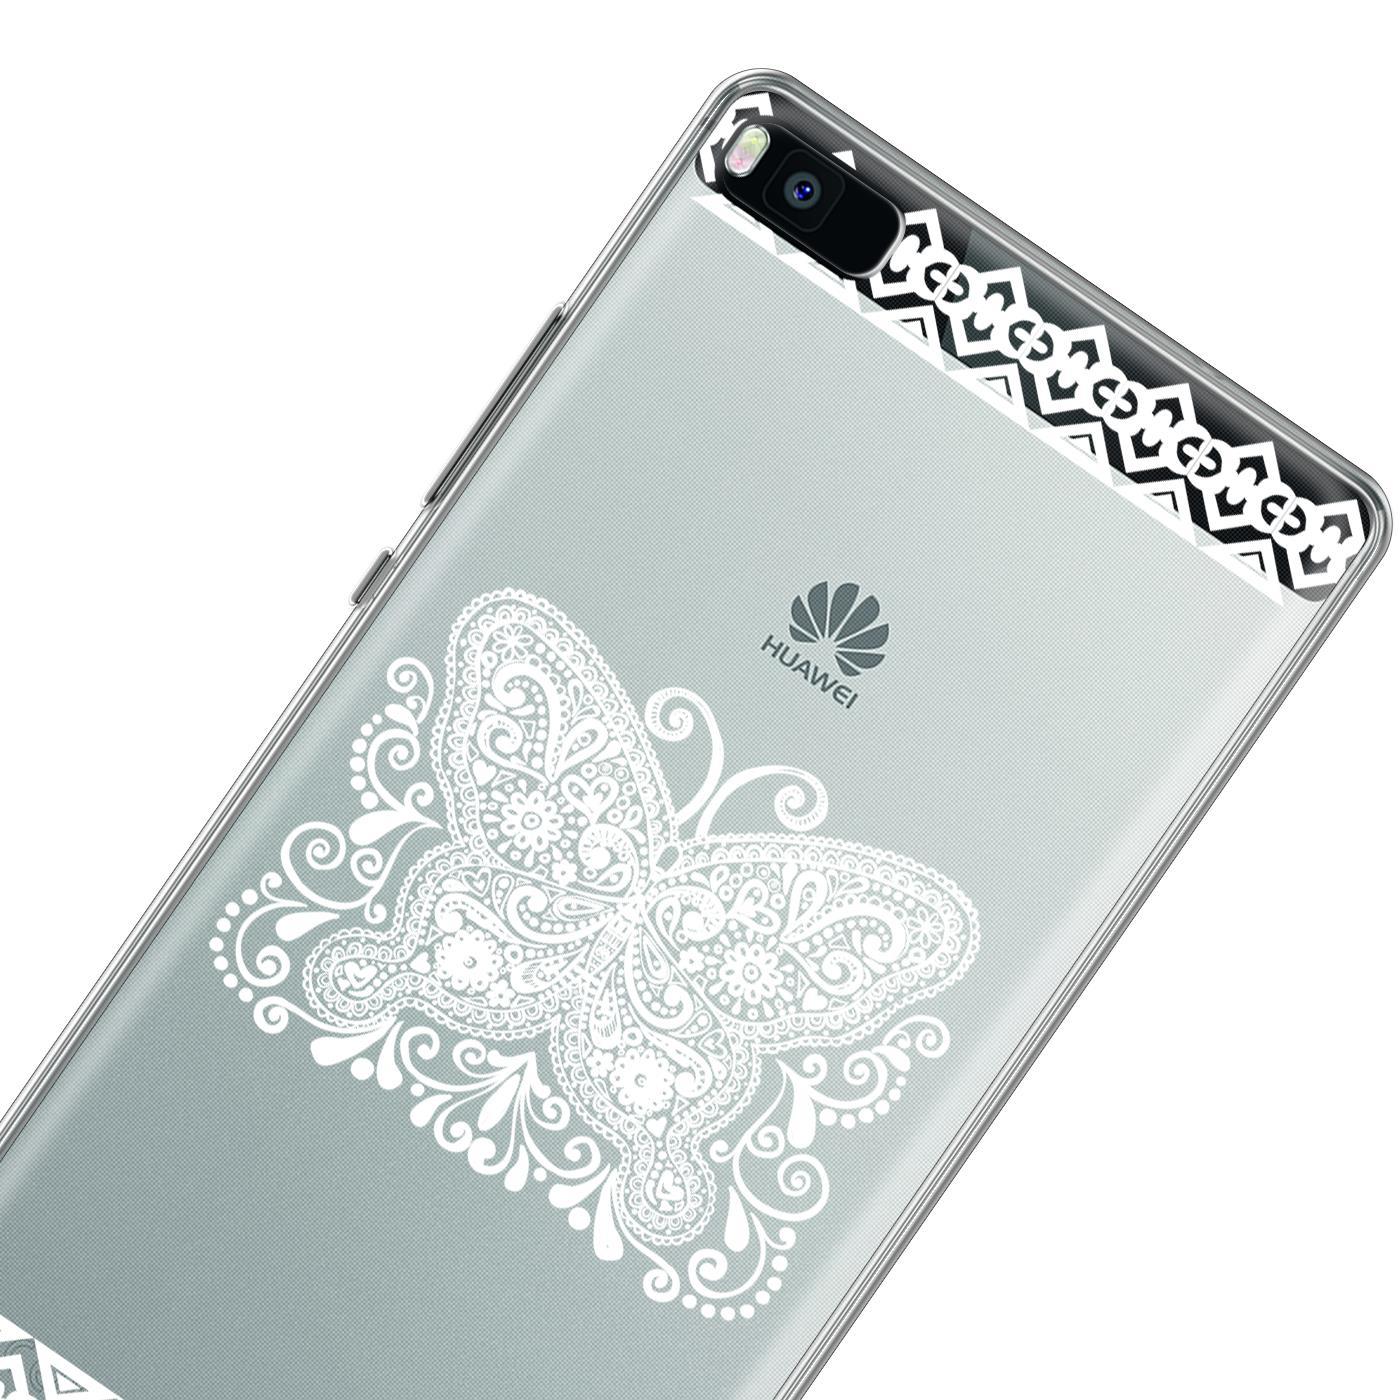 Huawei P8 Handy Schutz Hülle Case TPU Silikon Cover Tasche Mandala Etui Muster